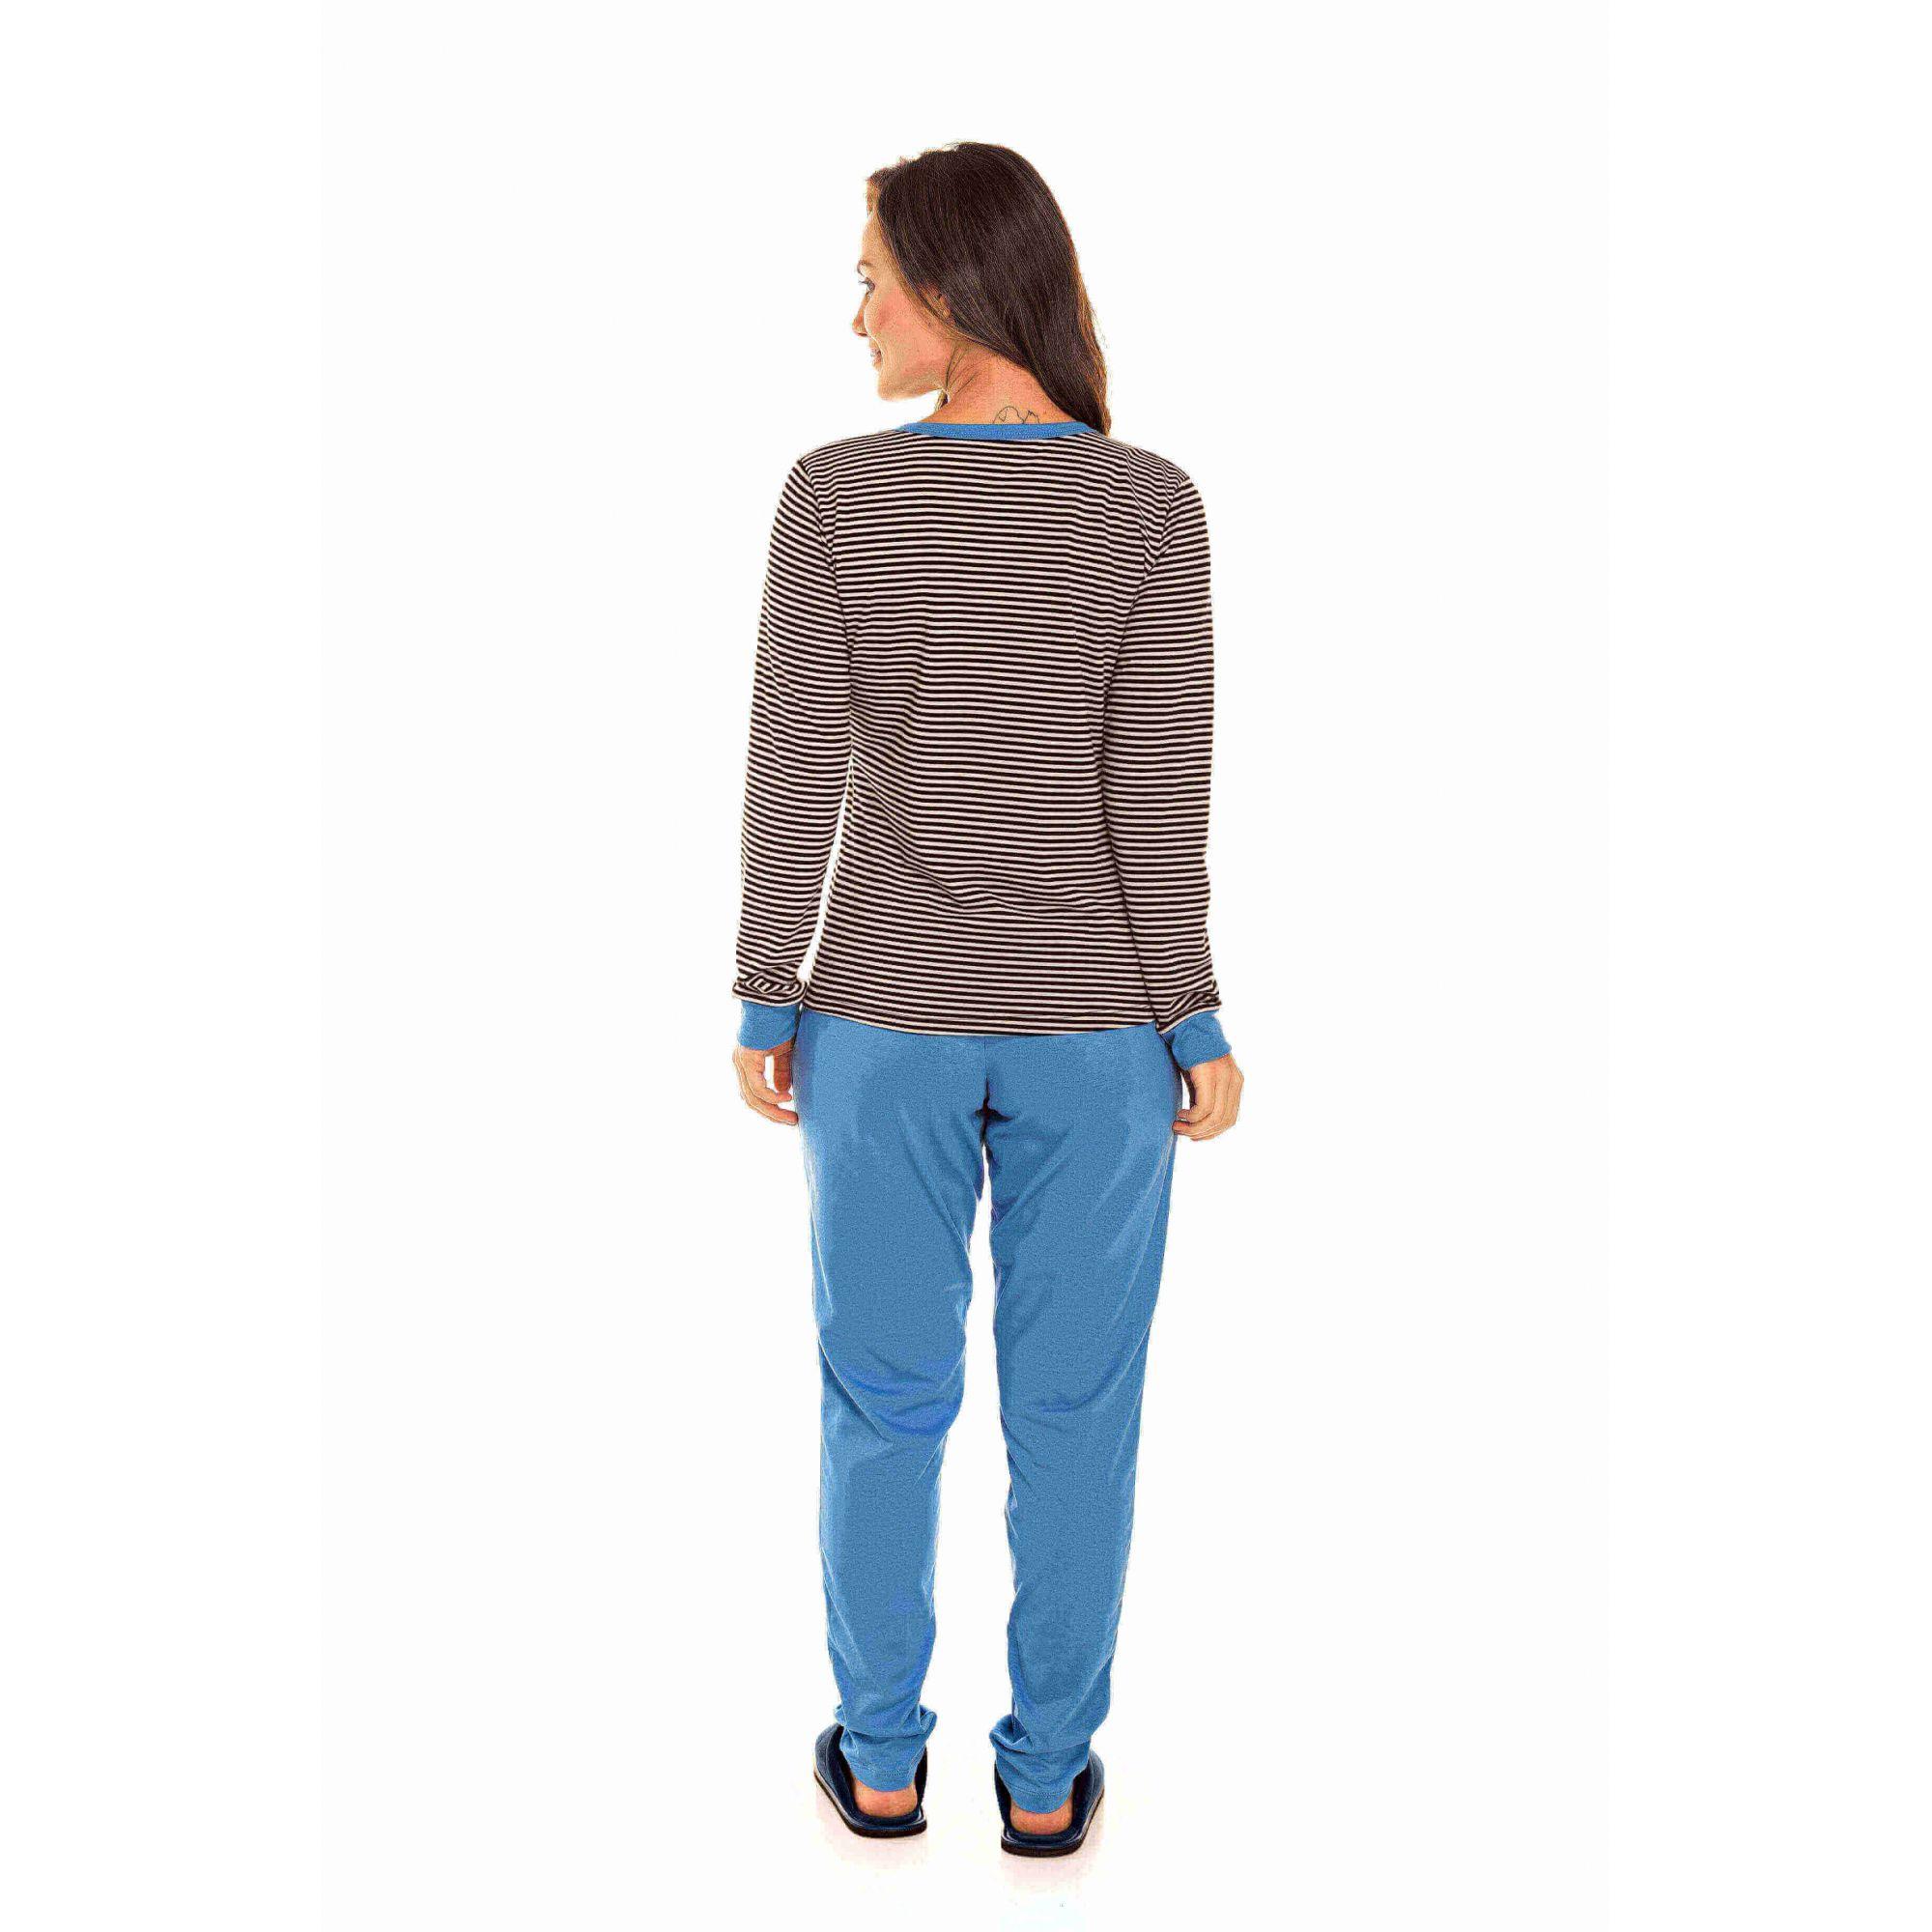 088/A - Pijama  Adulto Feminino Aberto Listrado Azul